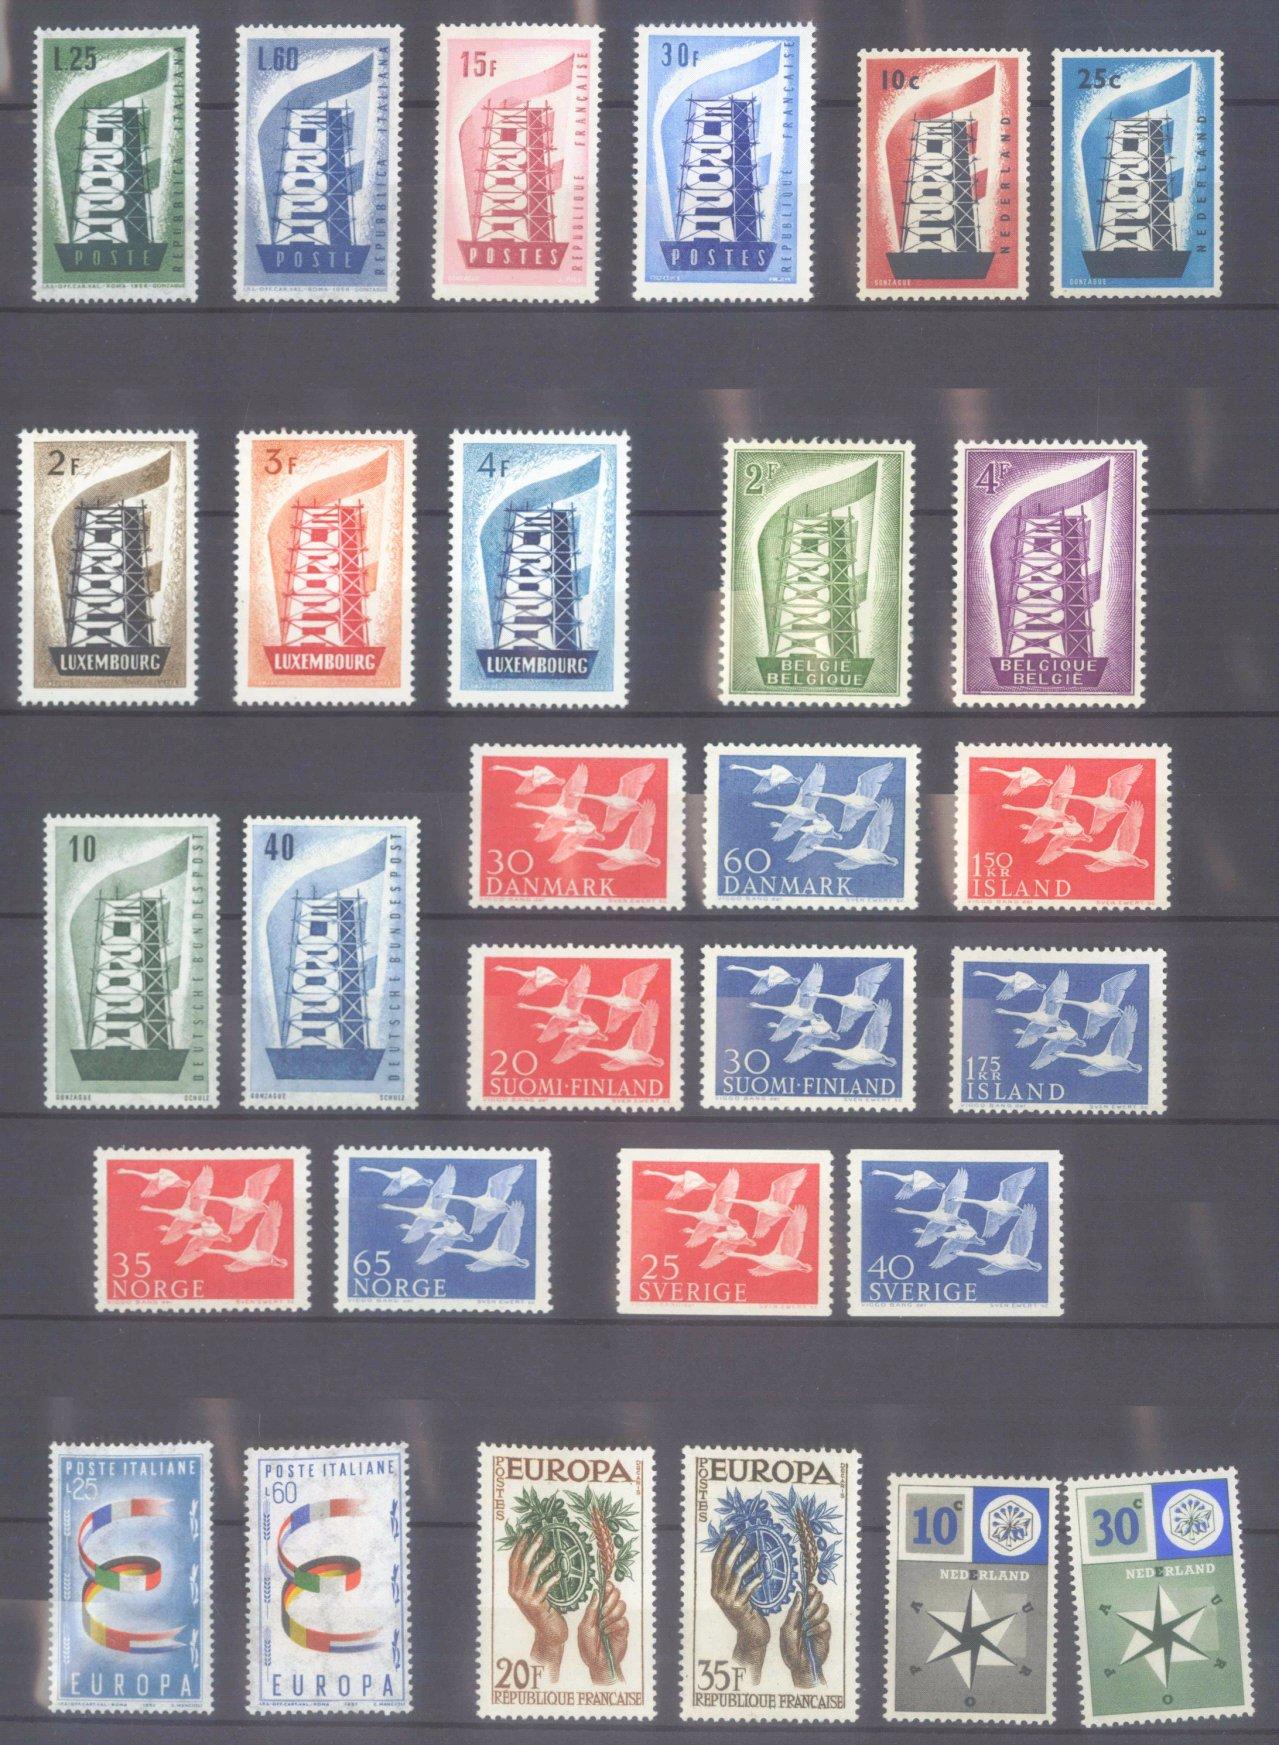 EUROPA CEPT 1956 – 1970